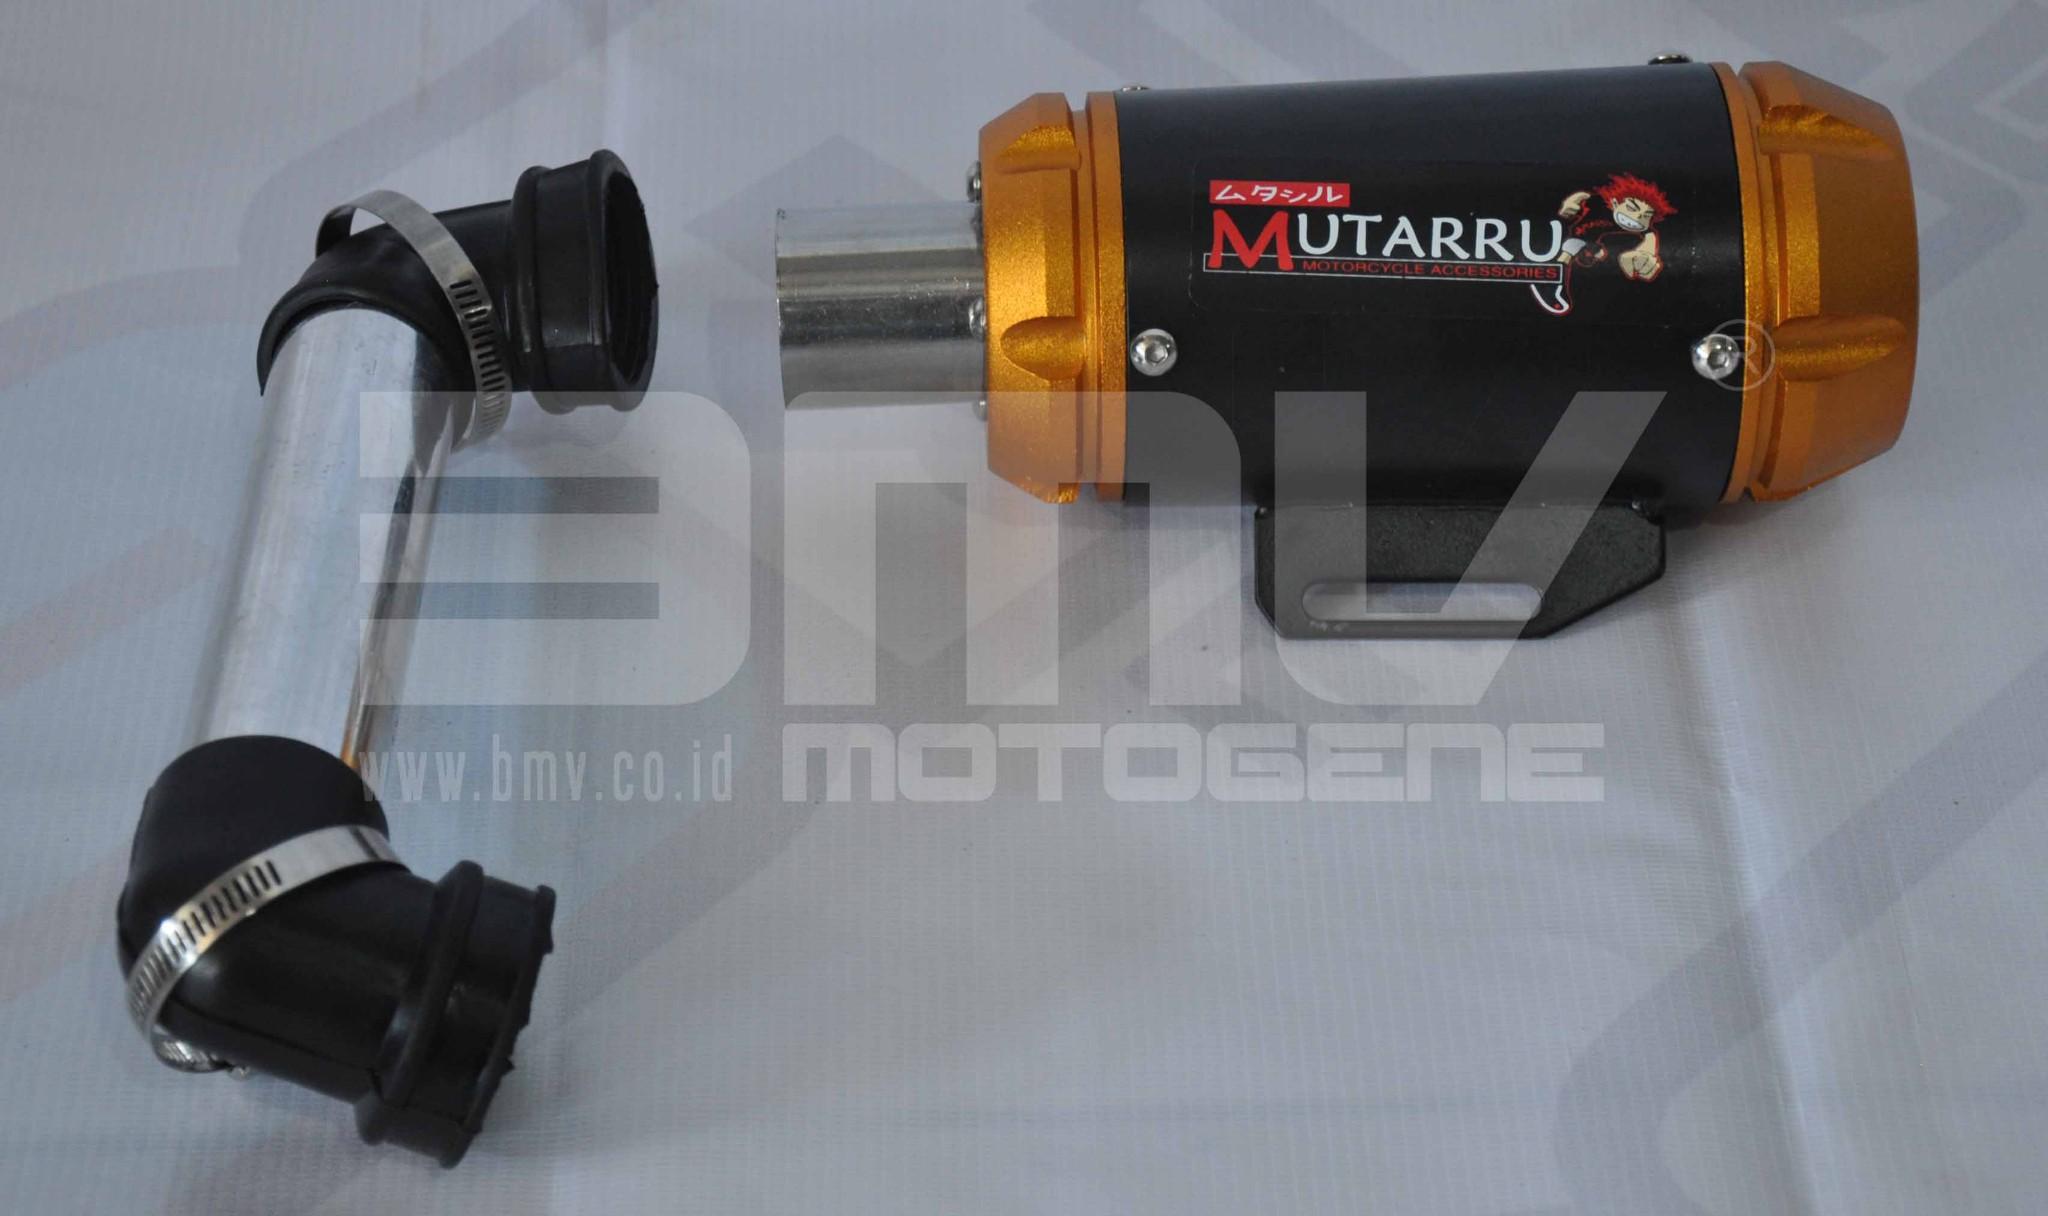 82 Modifikasi Filter Udara Scoopy Fi   Kumpulan Modifikasi Motor Scoopy Terbaru